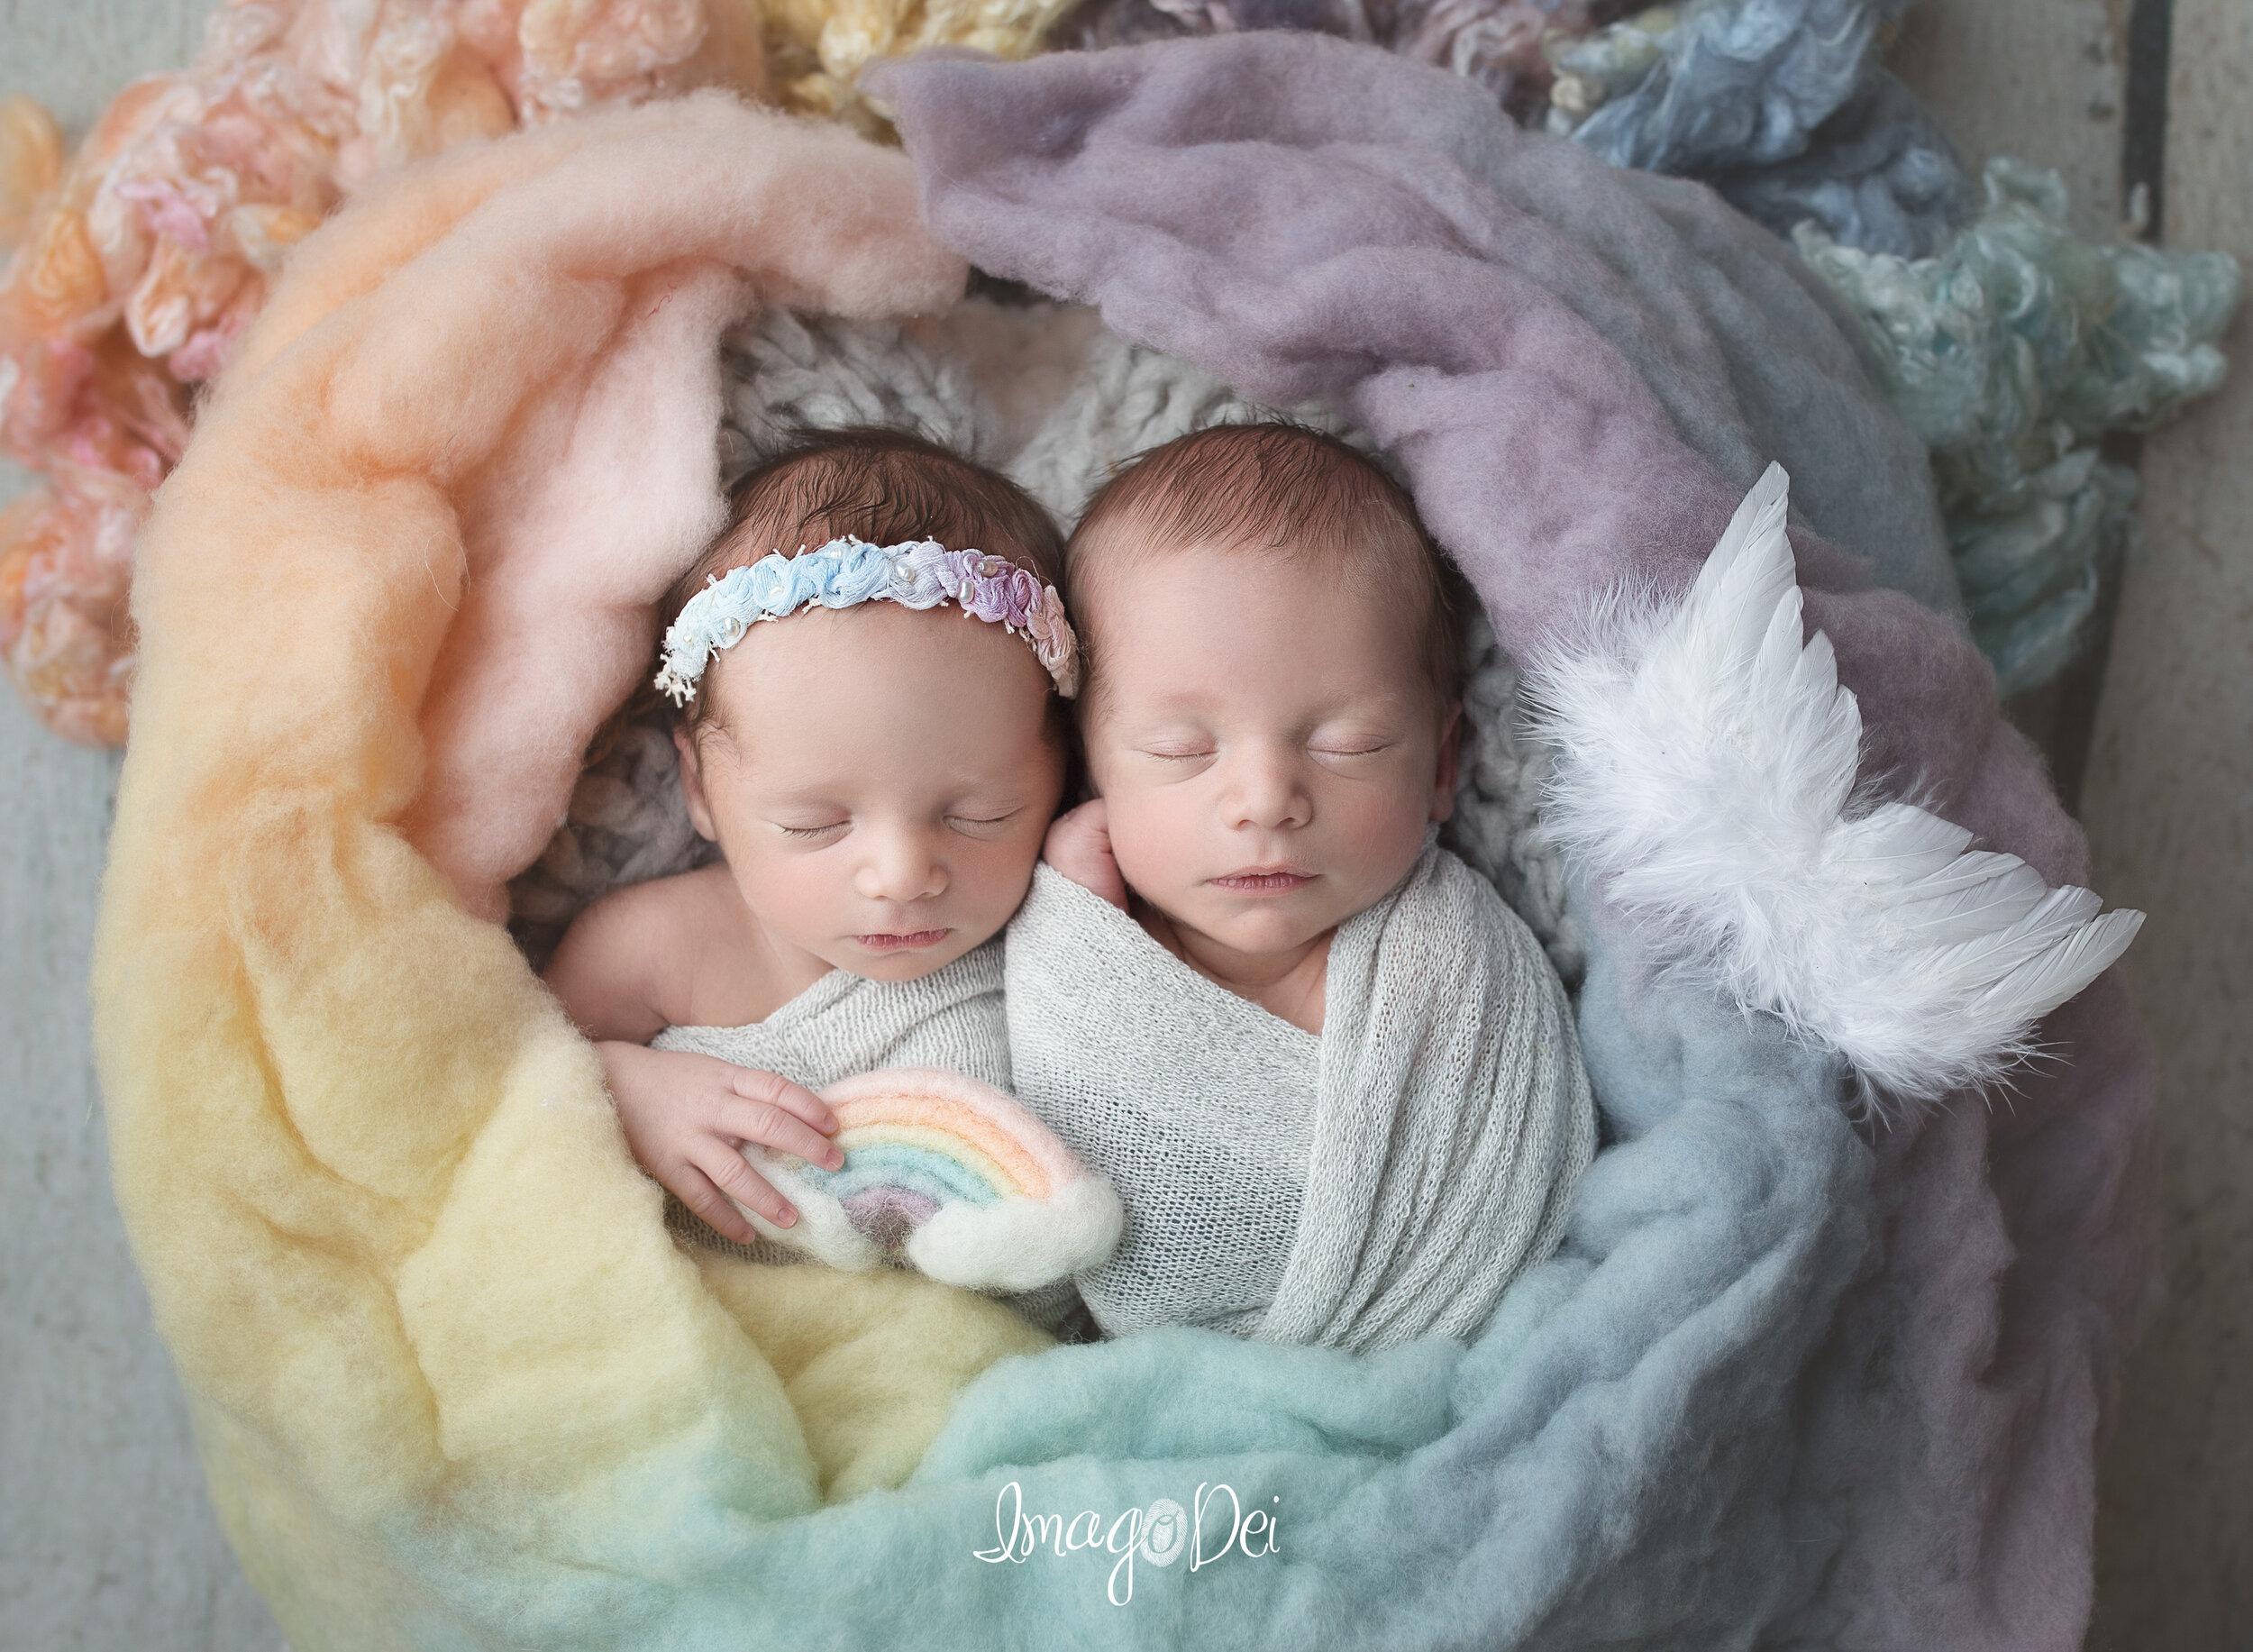 imago dei photography- gier twins website-1.jpg